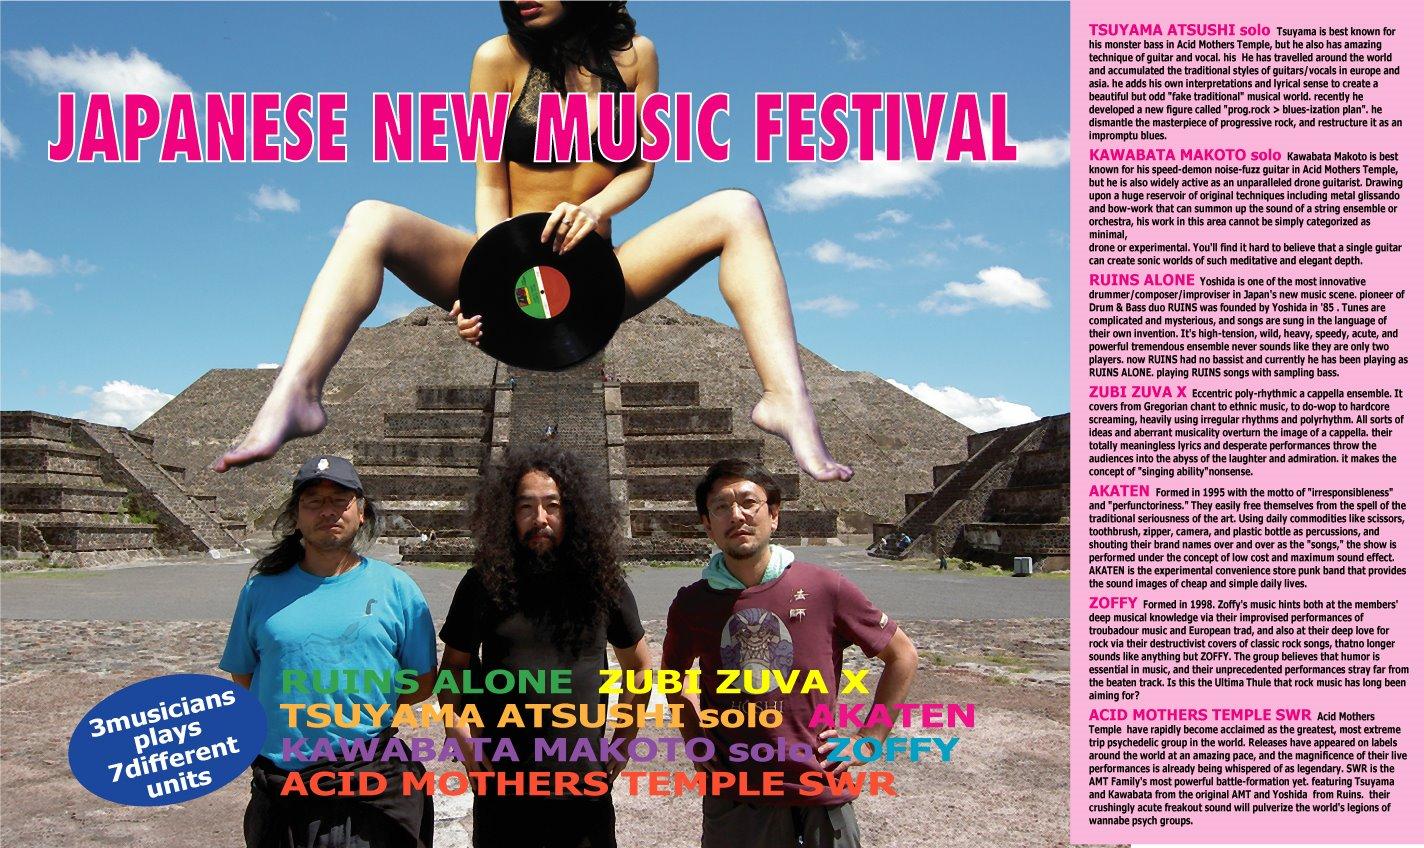 Acid Mothers Temple & The Melting Paraiso UFO* Acid Mothers Temple & The Melting Paraiso U.F.O. - Pataphisical Freak Out MU!!